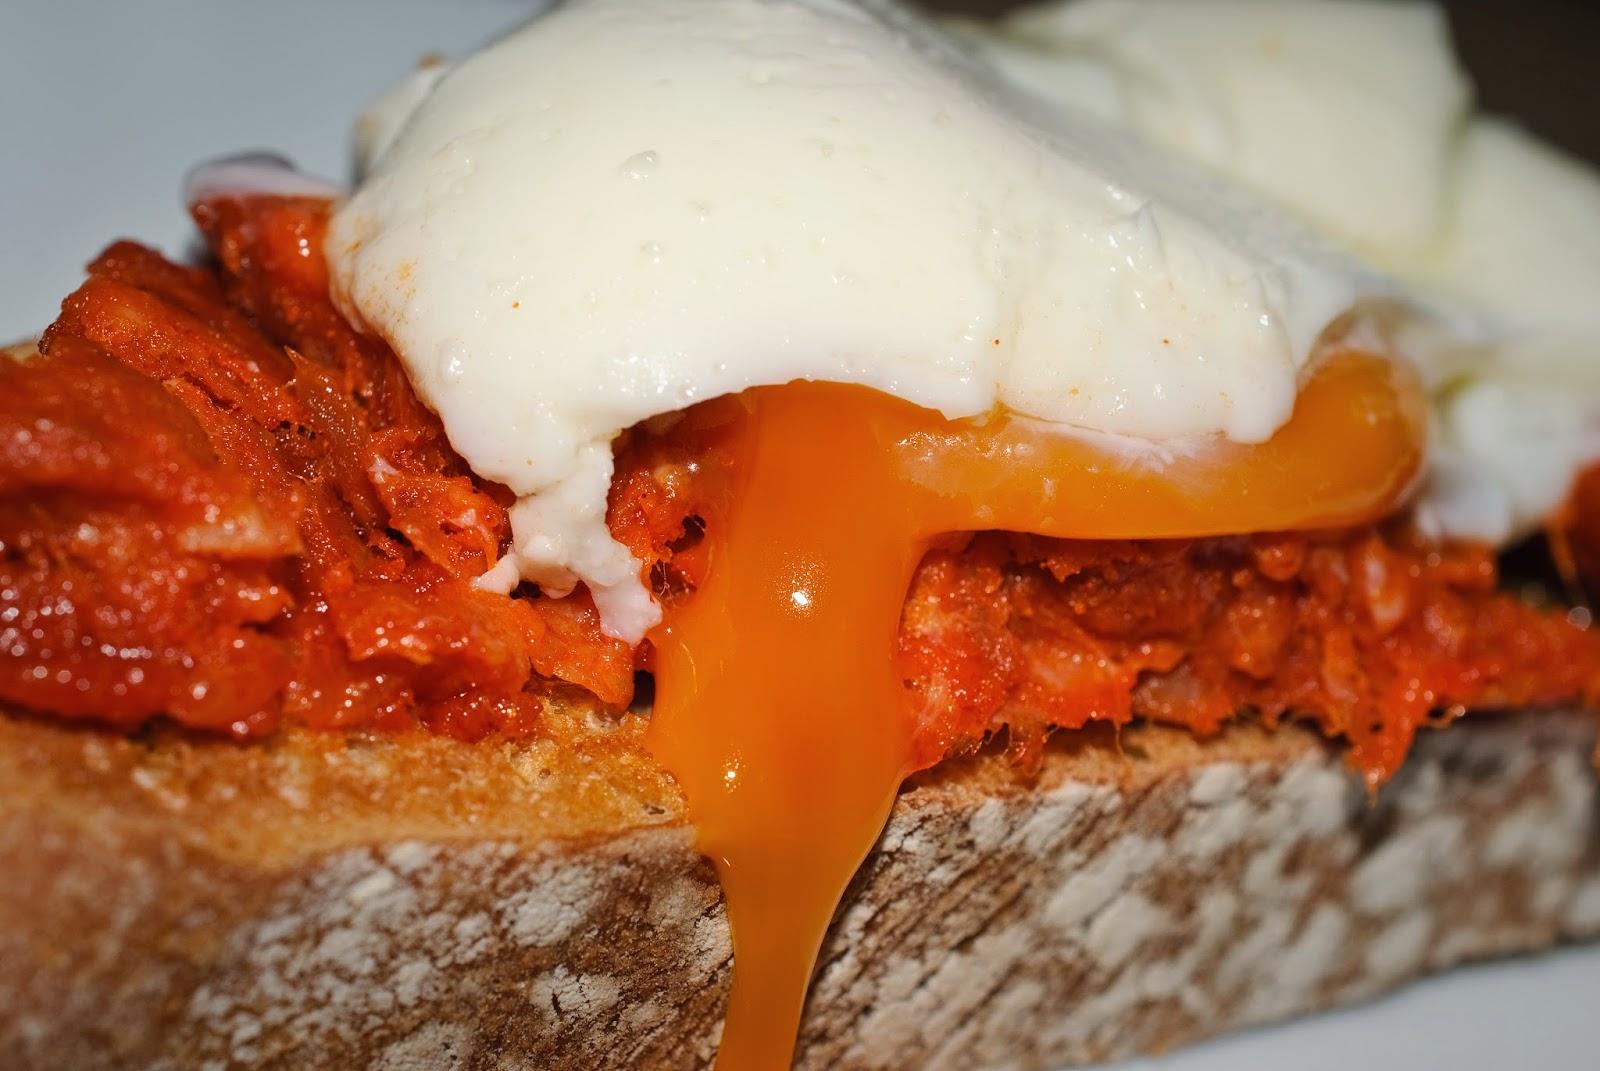 Tosta de sobrasada y huevo; sobrassada and egg toast